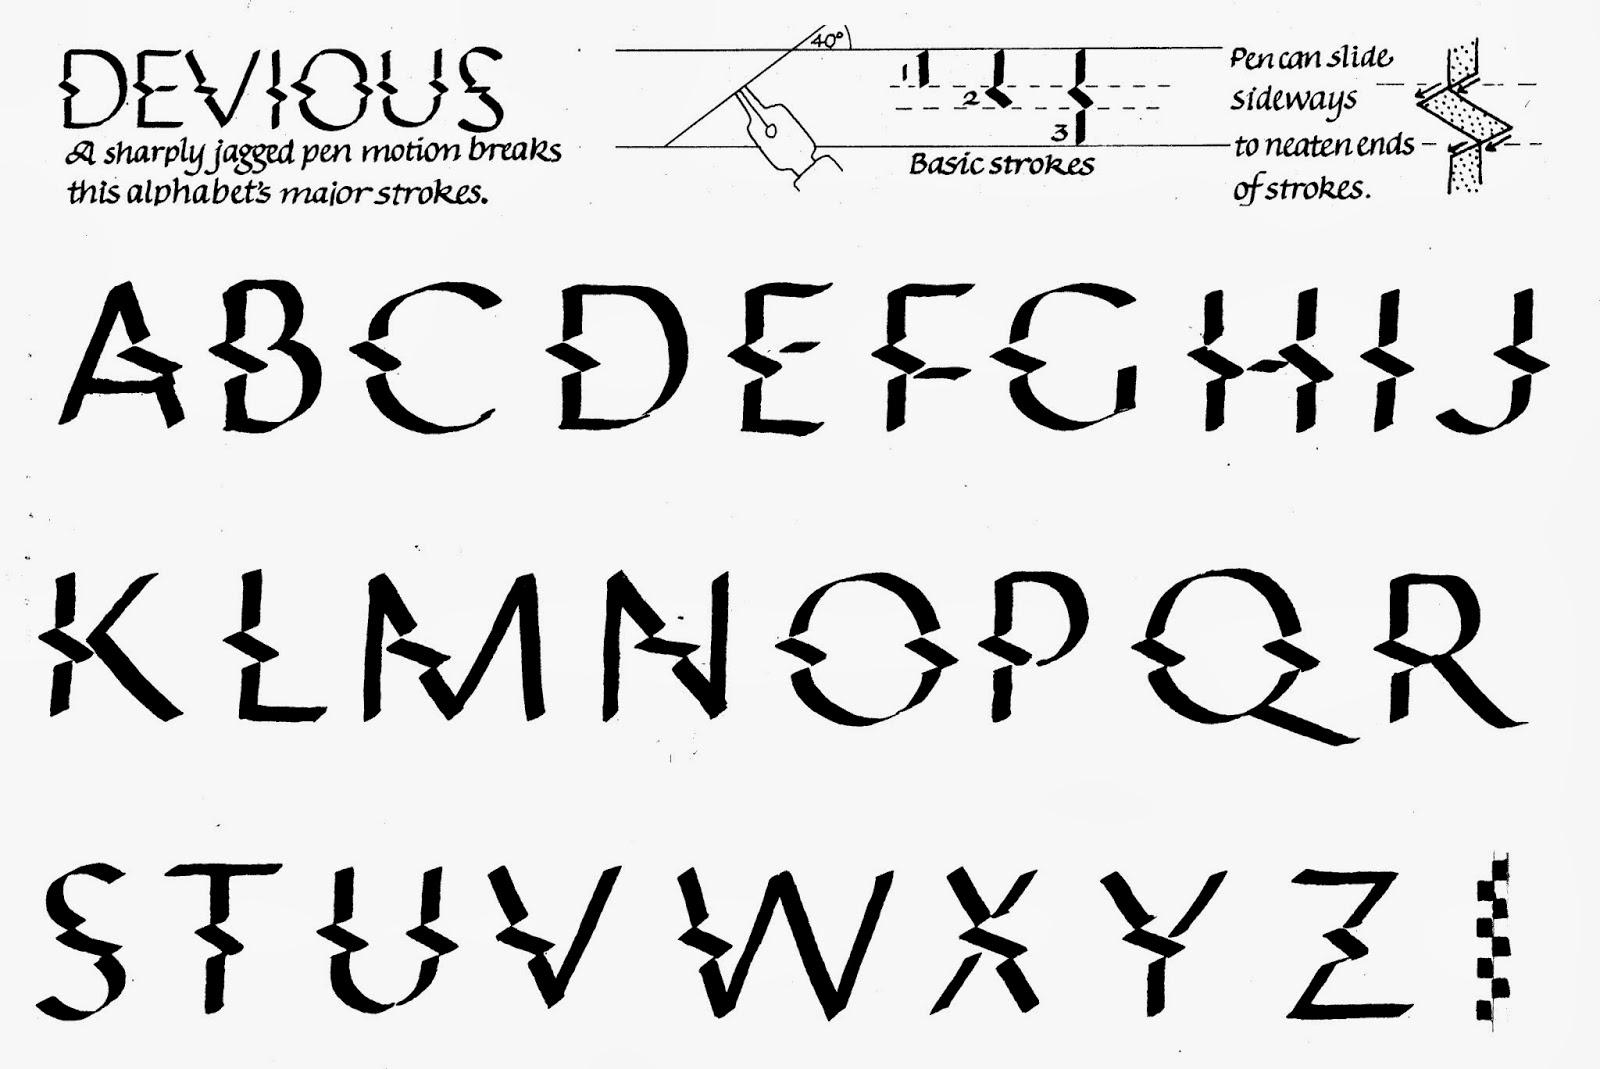 Margaret Shepherd: Calligraphy Blog: 250 Devious